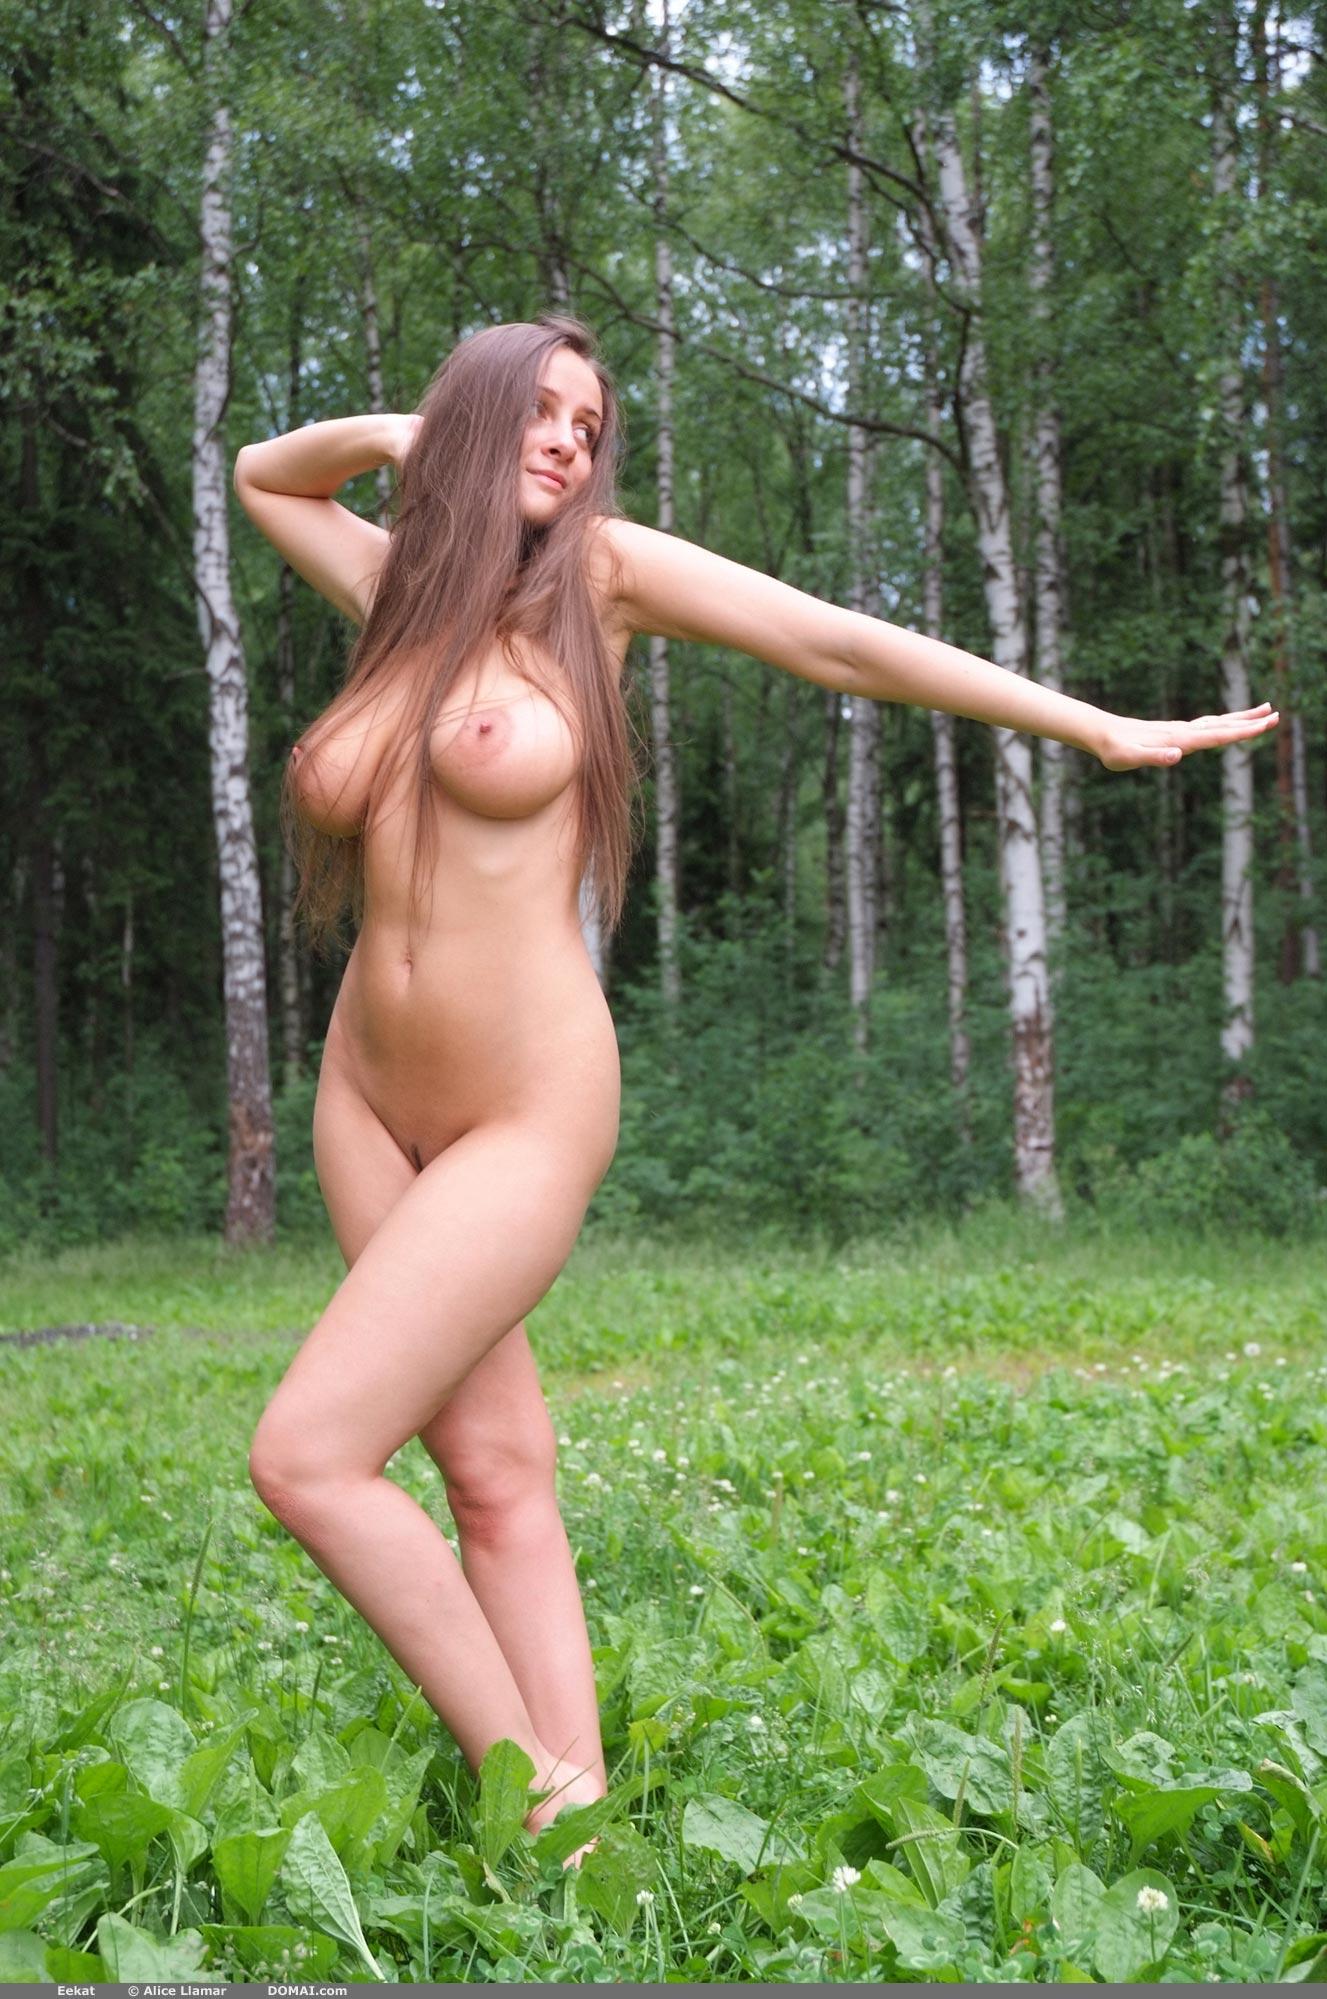 golie-soski-na-prirode-foto